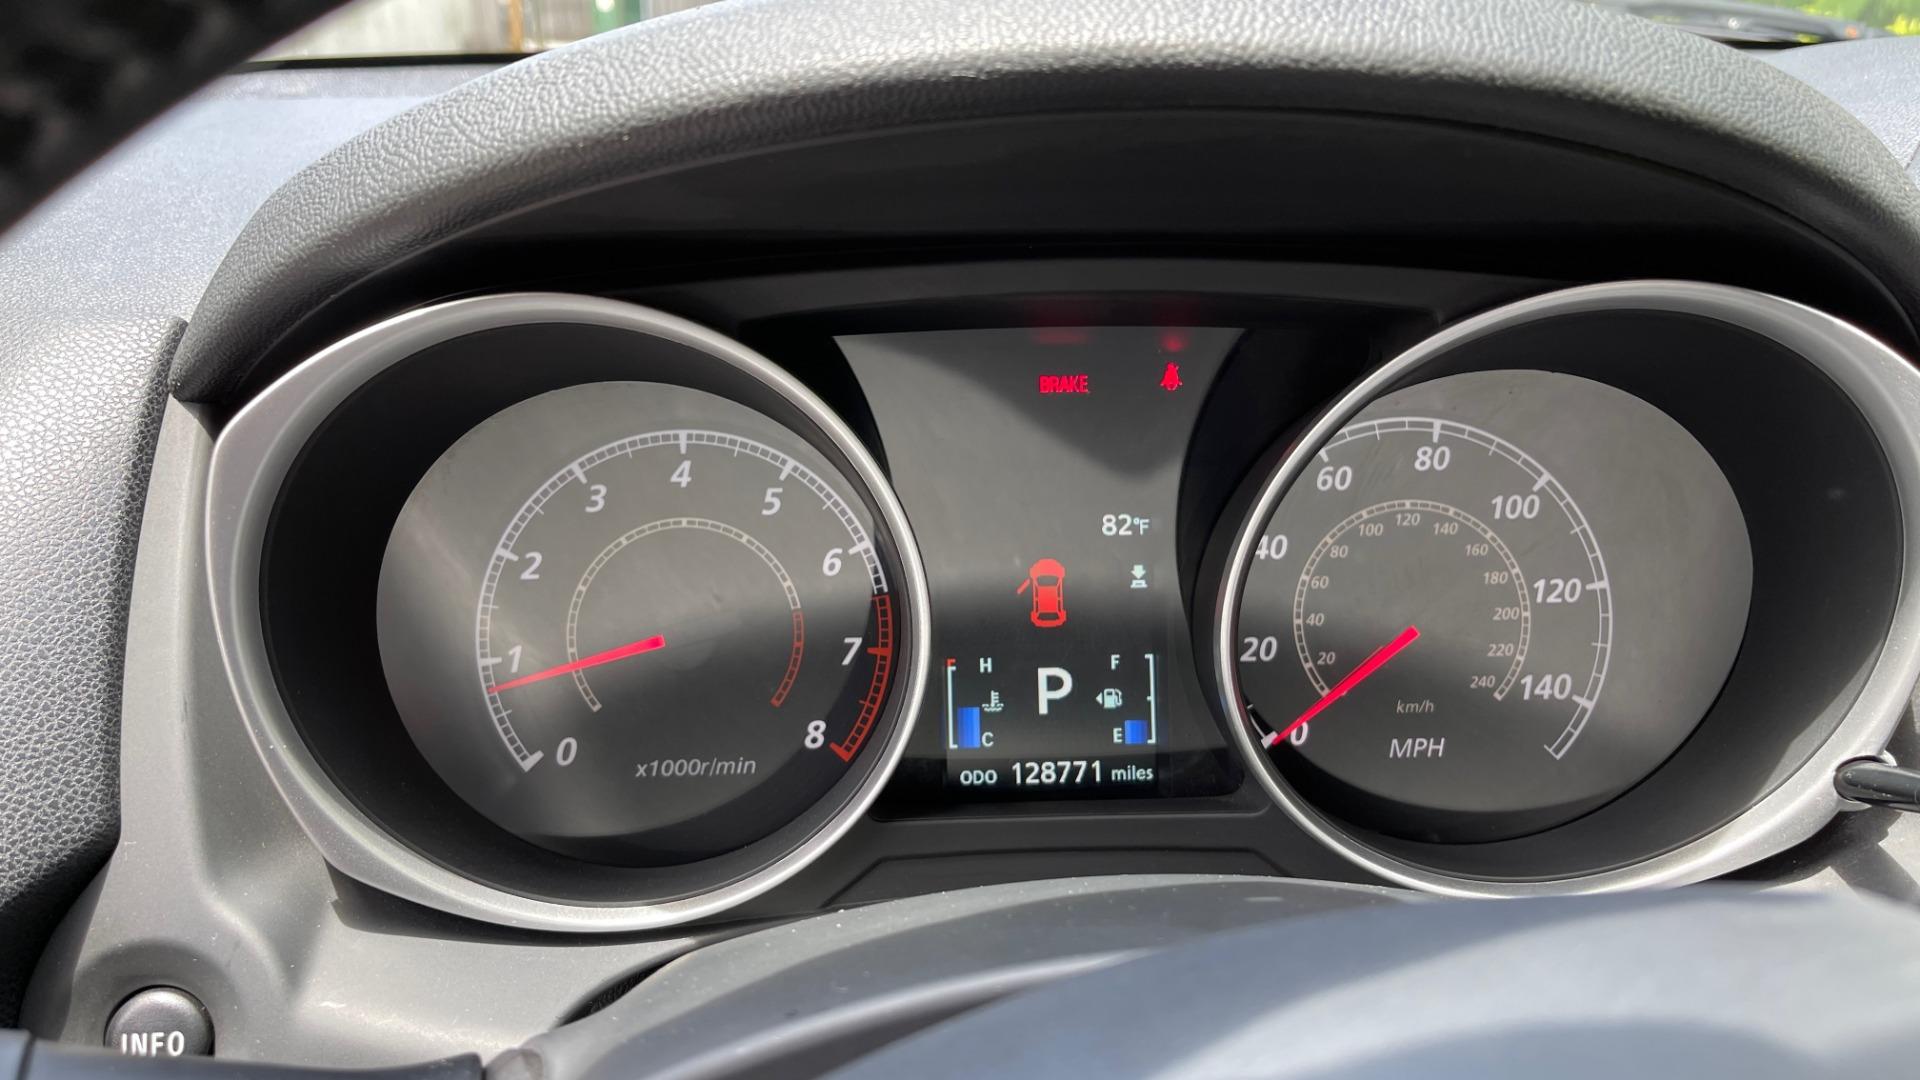 Used 2014 Mitsubishi OUTLANDER SPORT ES 2WD / 2.0L / CVT TRANS / 18IN WHEELS / 31MPG for sale $8,495 at Formula Imports in Charlotte NC 28227 33